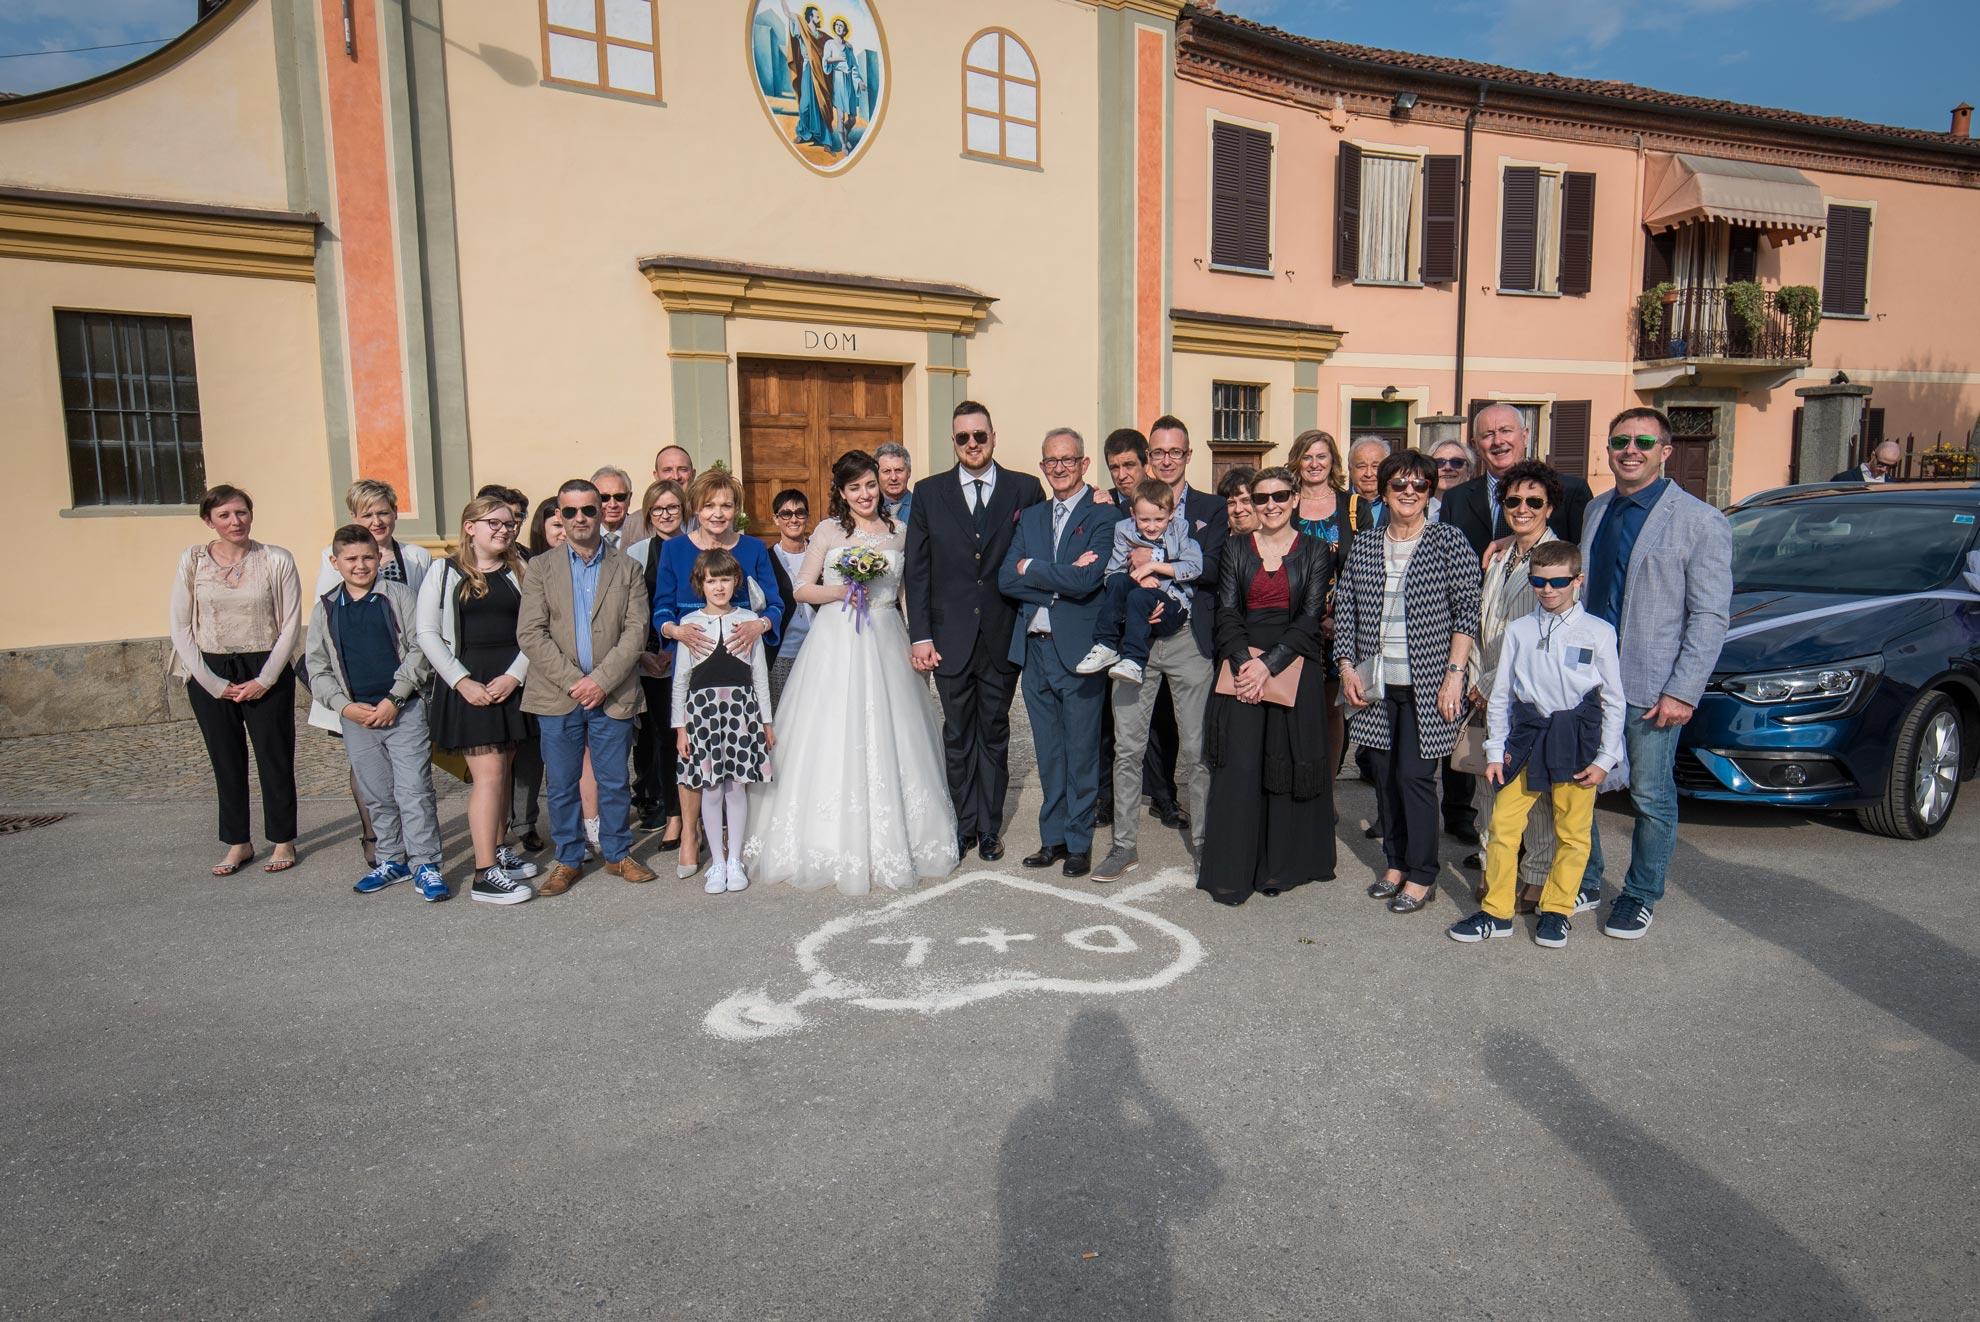 Matrimonio a Narzole Lorenza Diego - DSC 0636 - Fotografie matrimonio con parenti - Fotografie matrimonio con parenti